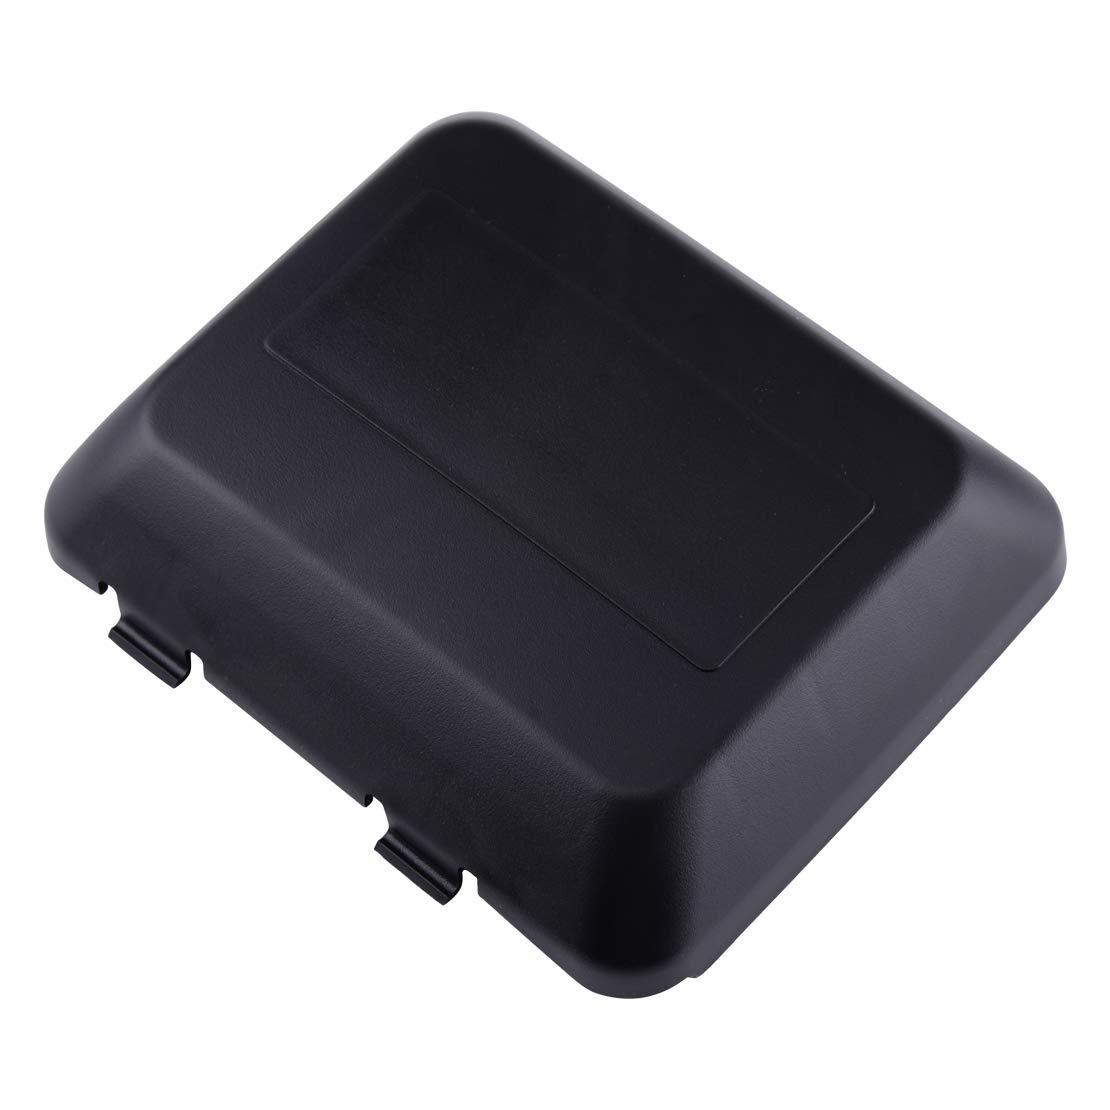 LETAOSK Black Air Filter Cover Fit for Honda GC160 GCV160 GCV135 GC135 GCV190 HRB216 HRS216 HRR216 HRT216 HRR216 HRZ216 Engine